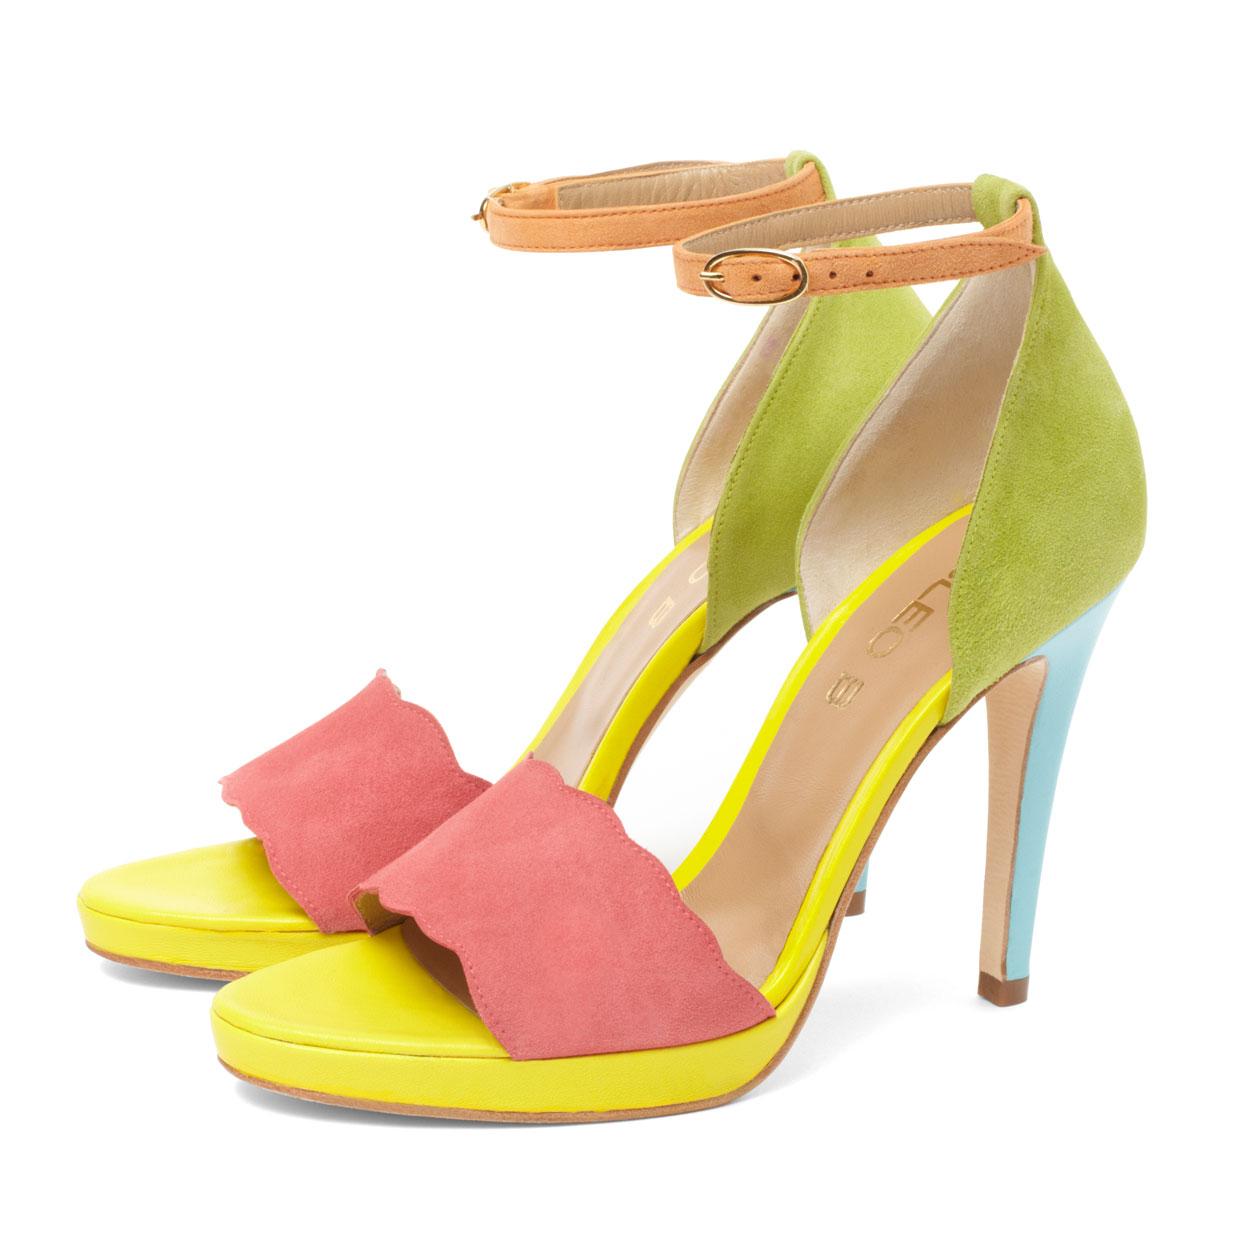 pepper-multi-pair-neon-colour-bright-sandal-heel-shoes-luxury-cleob.jpg